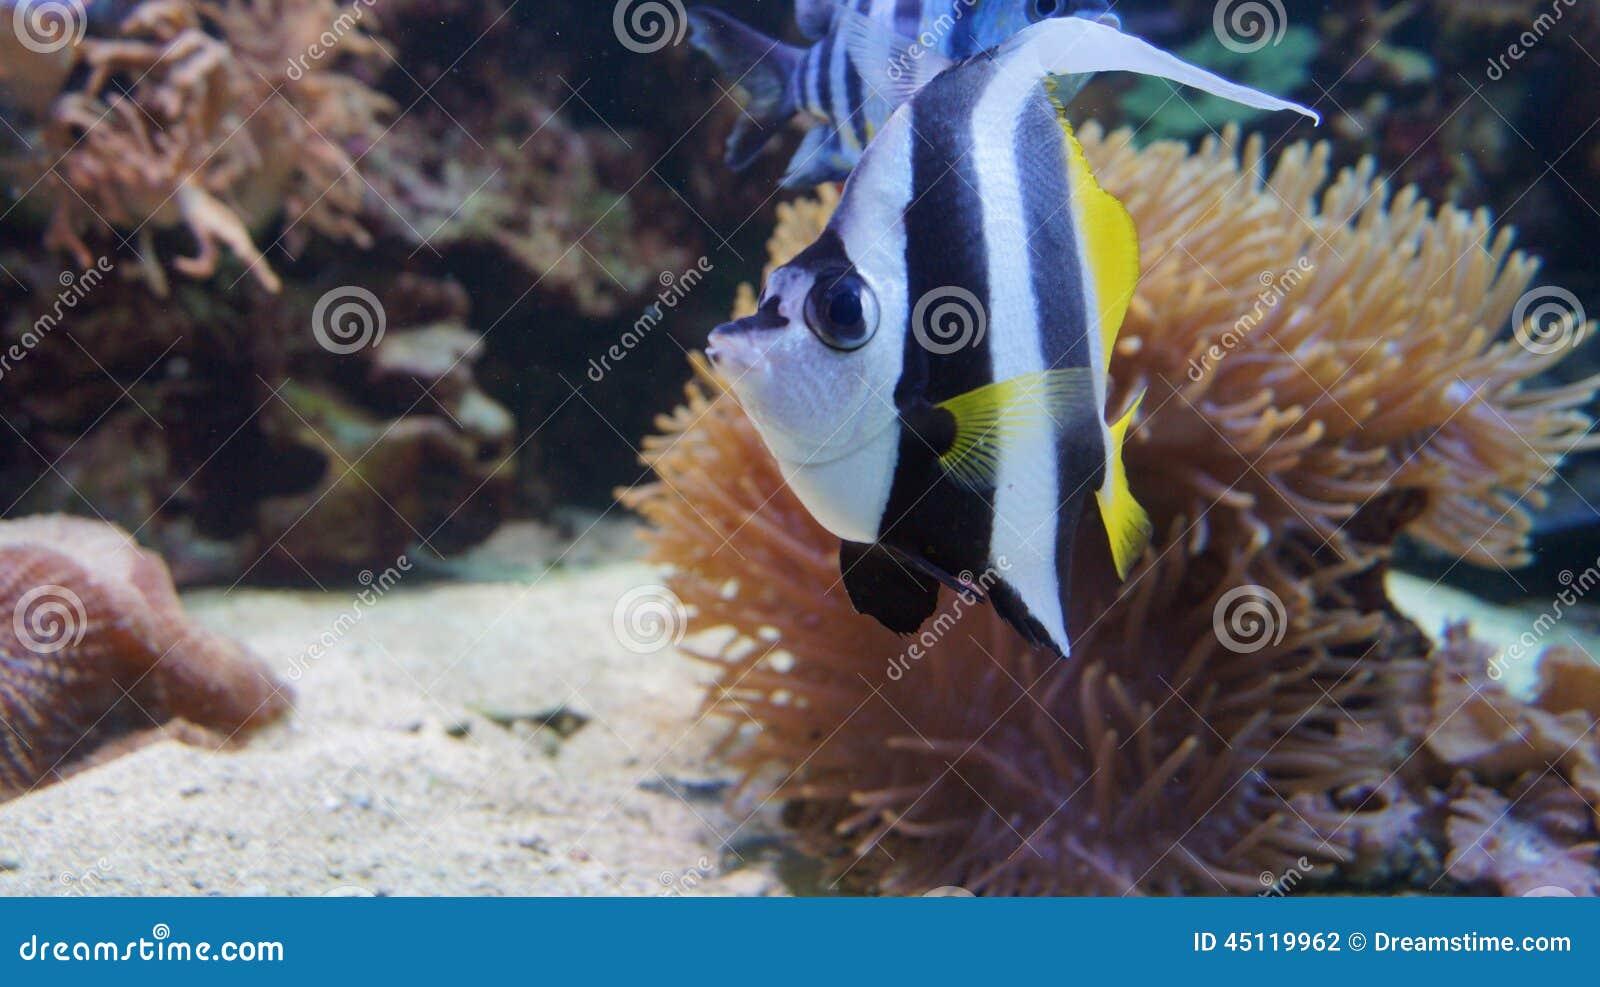 Tropical Fish Moorish Idol Corals Moorish Idol In The Sea And